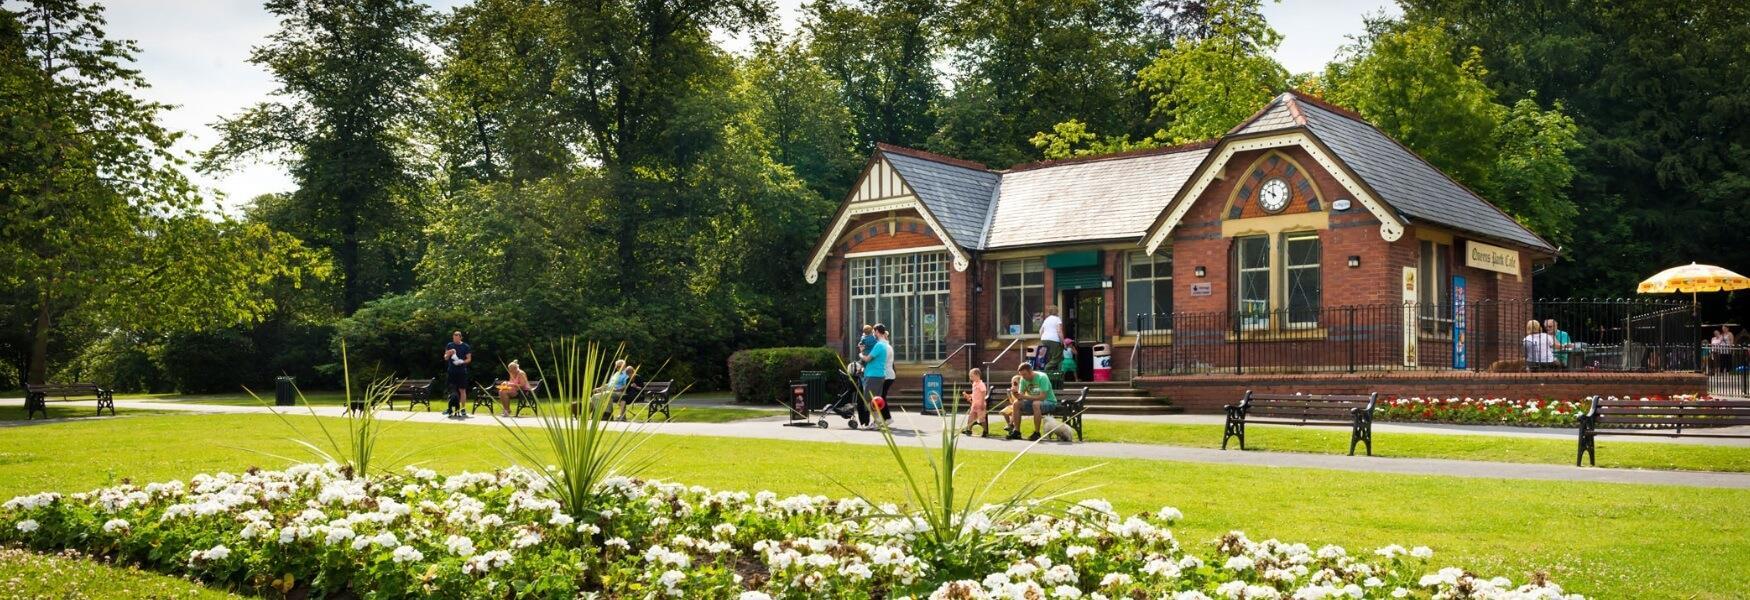 Visitors enjoying Heywood Park.